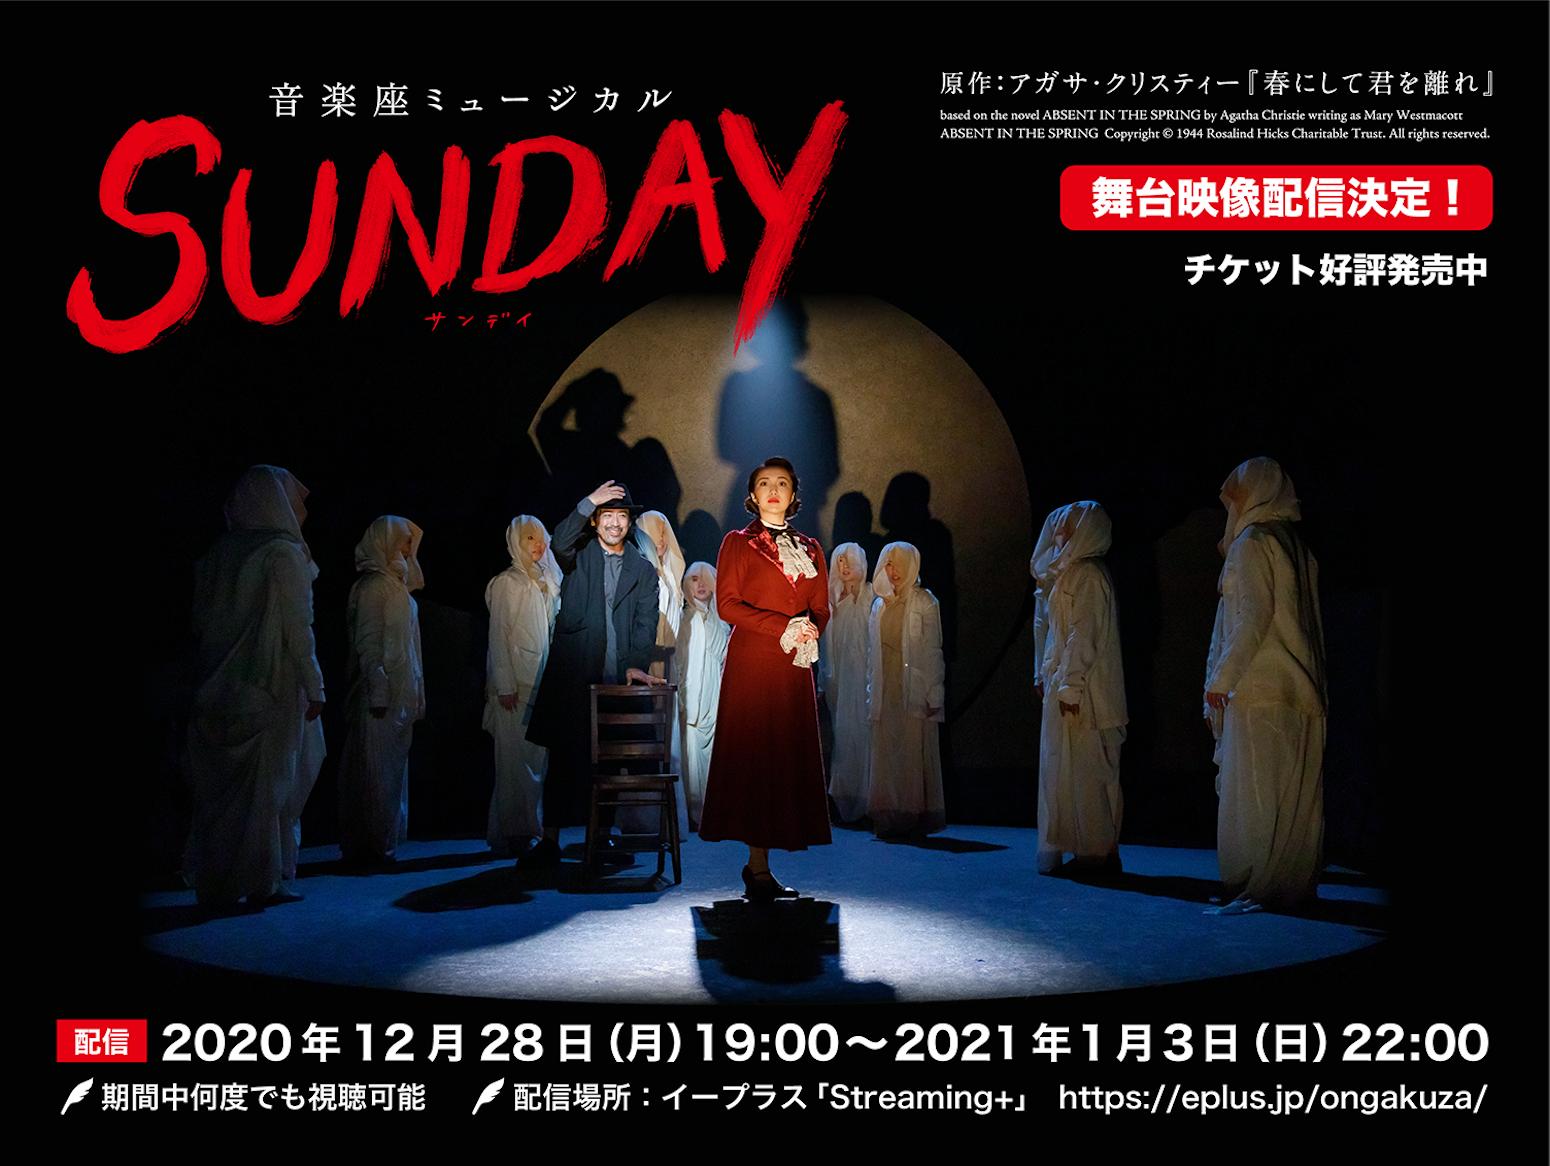 「SUNDAY(サンデイ)」